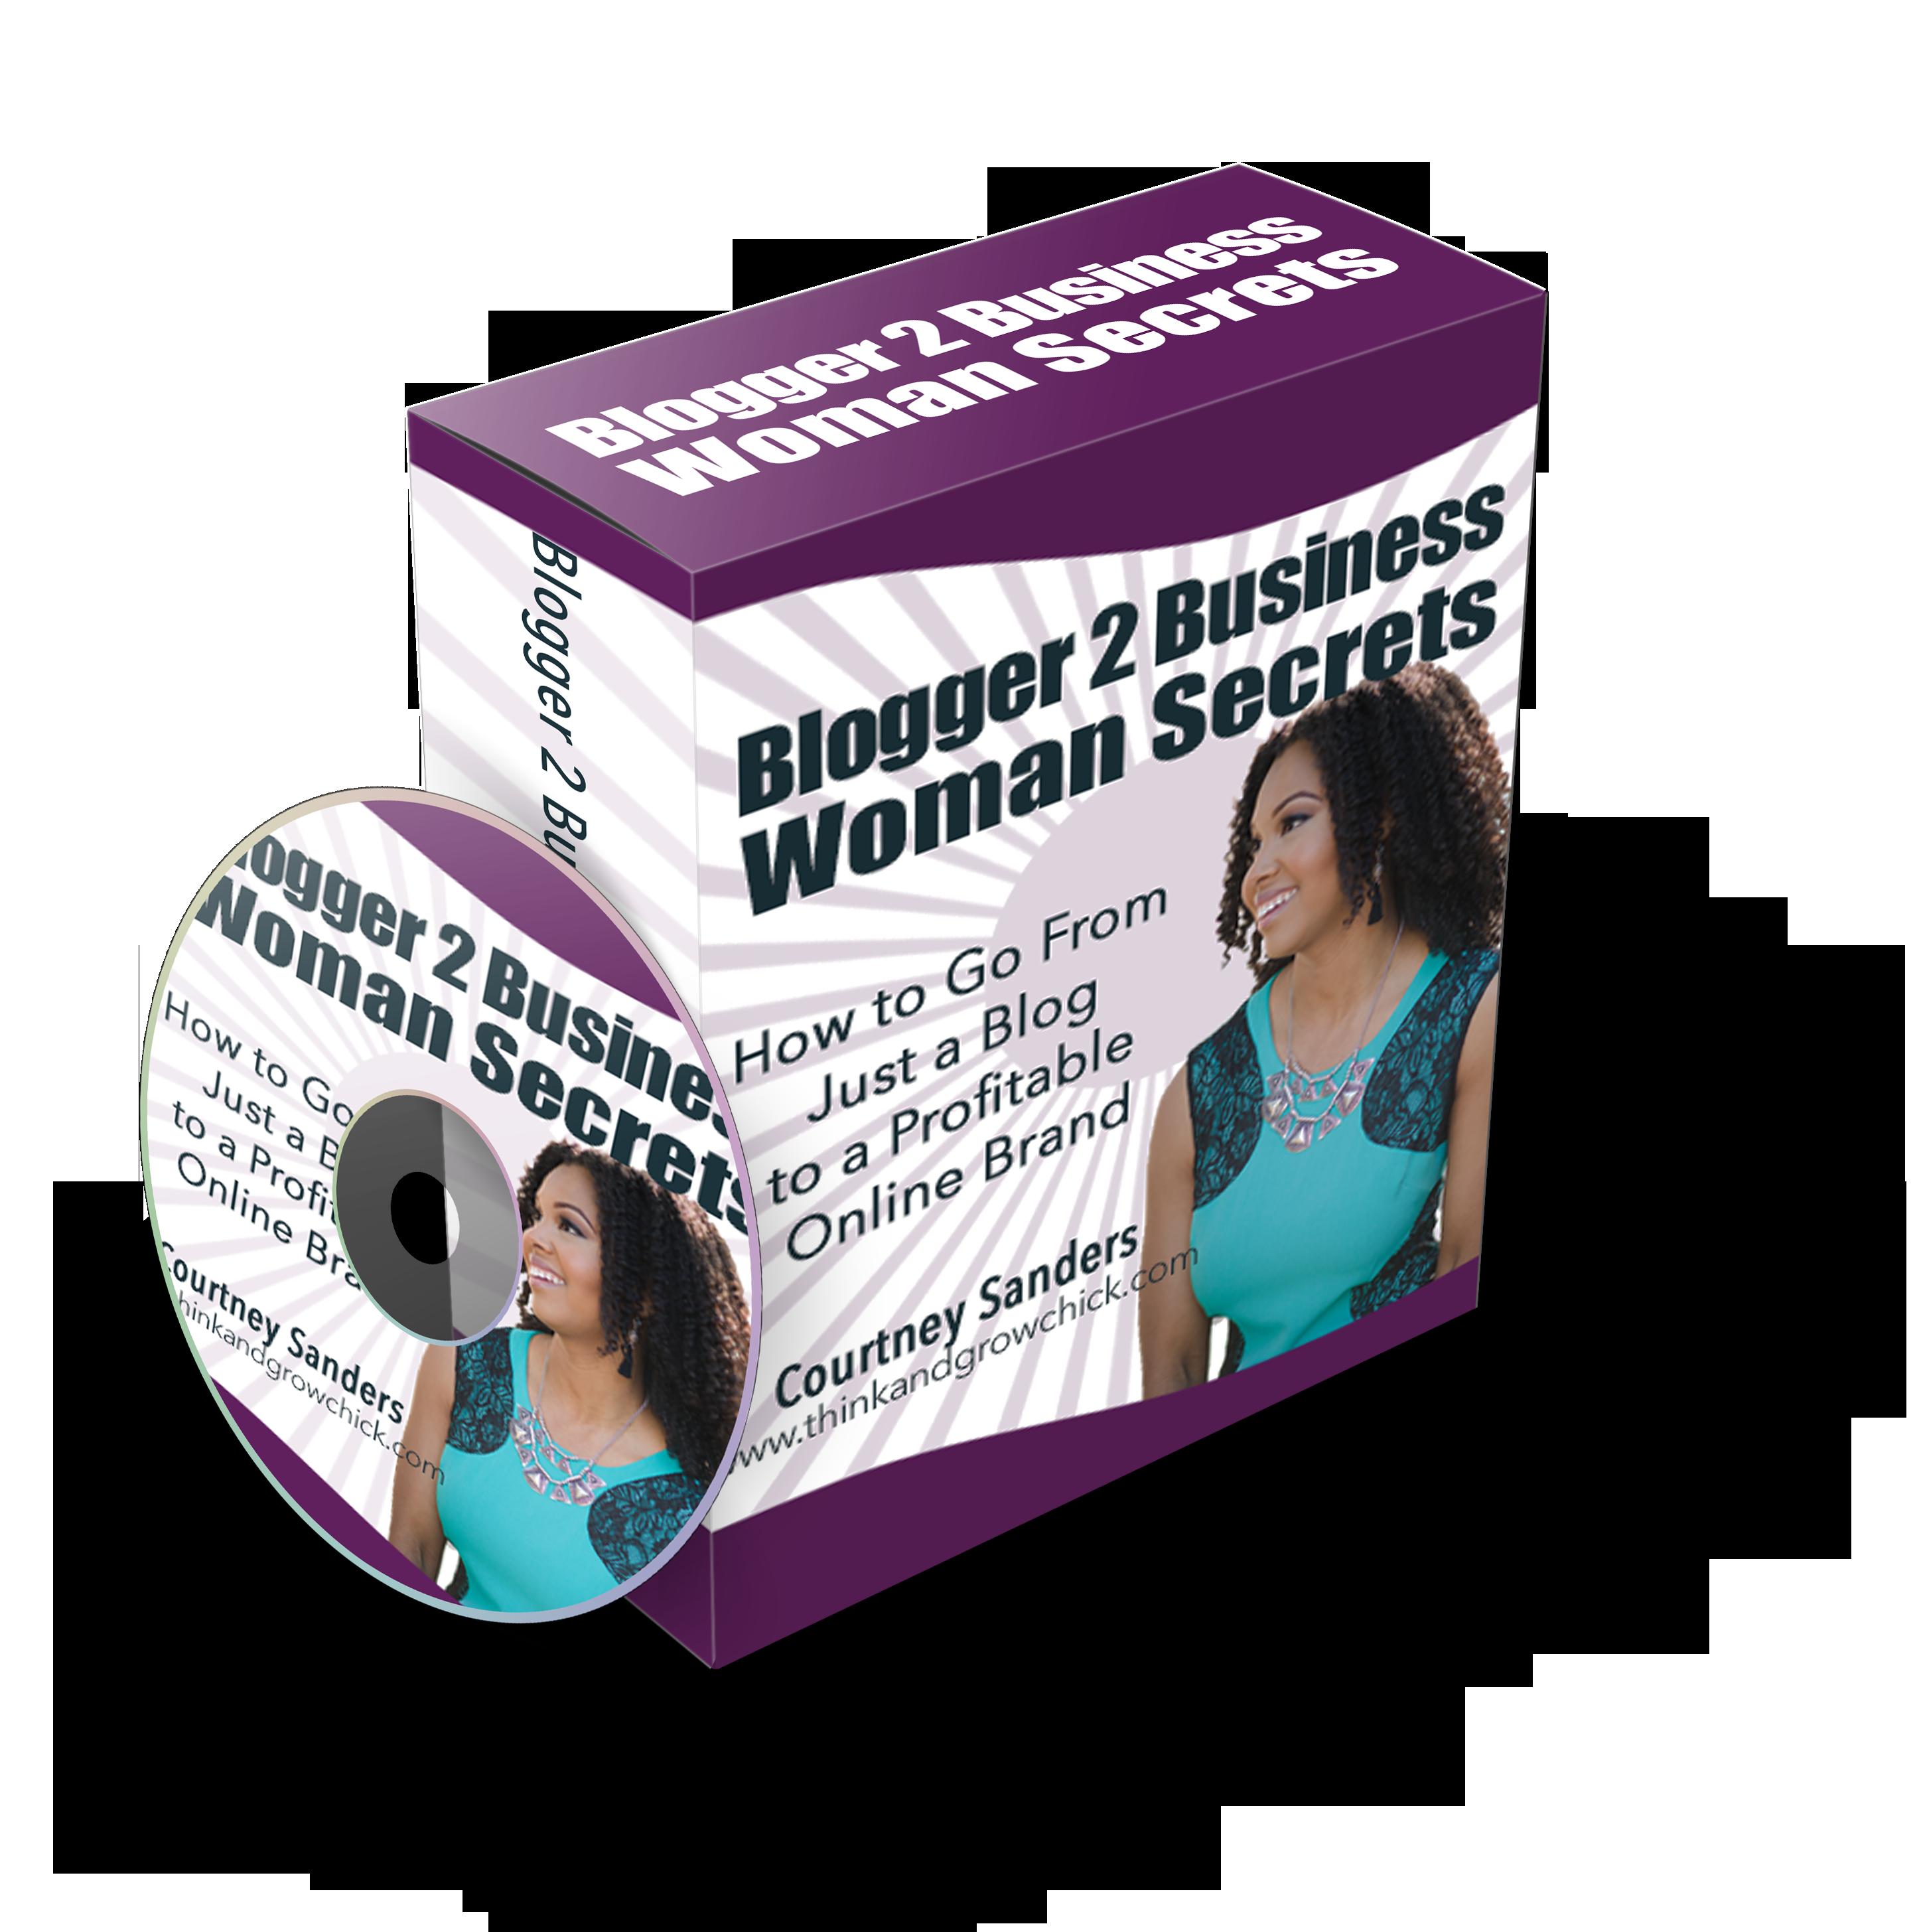 black and white download Businesswoman clipart woman entrepreneur. Blogger business secrets in.